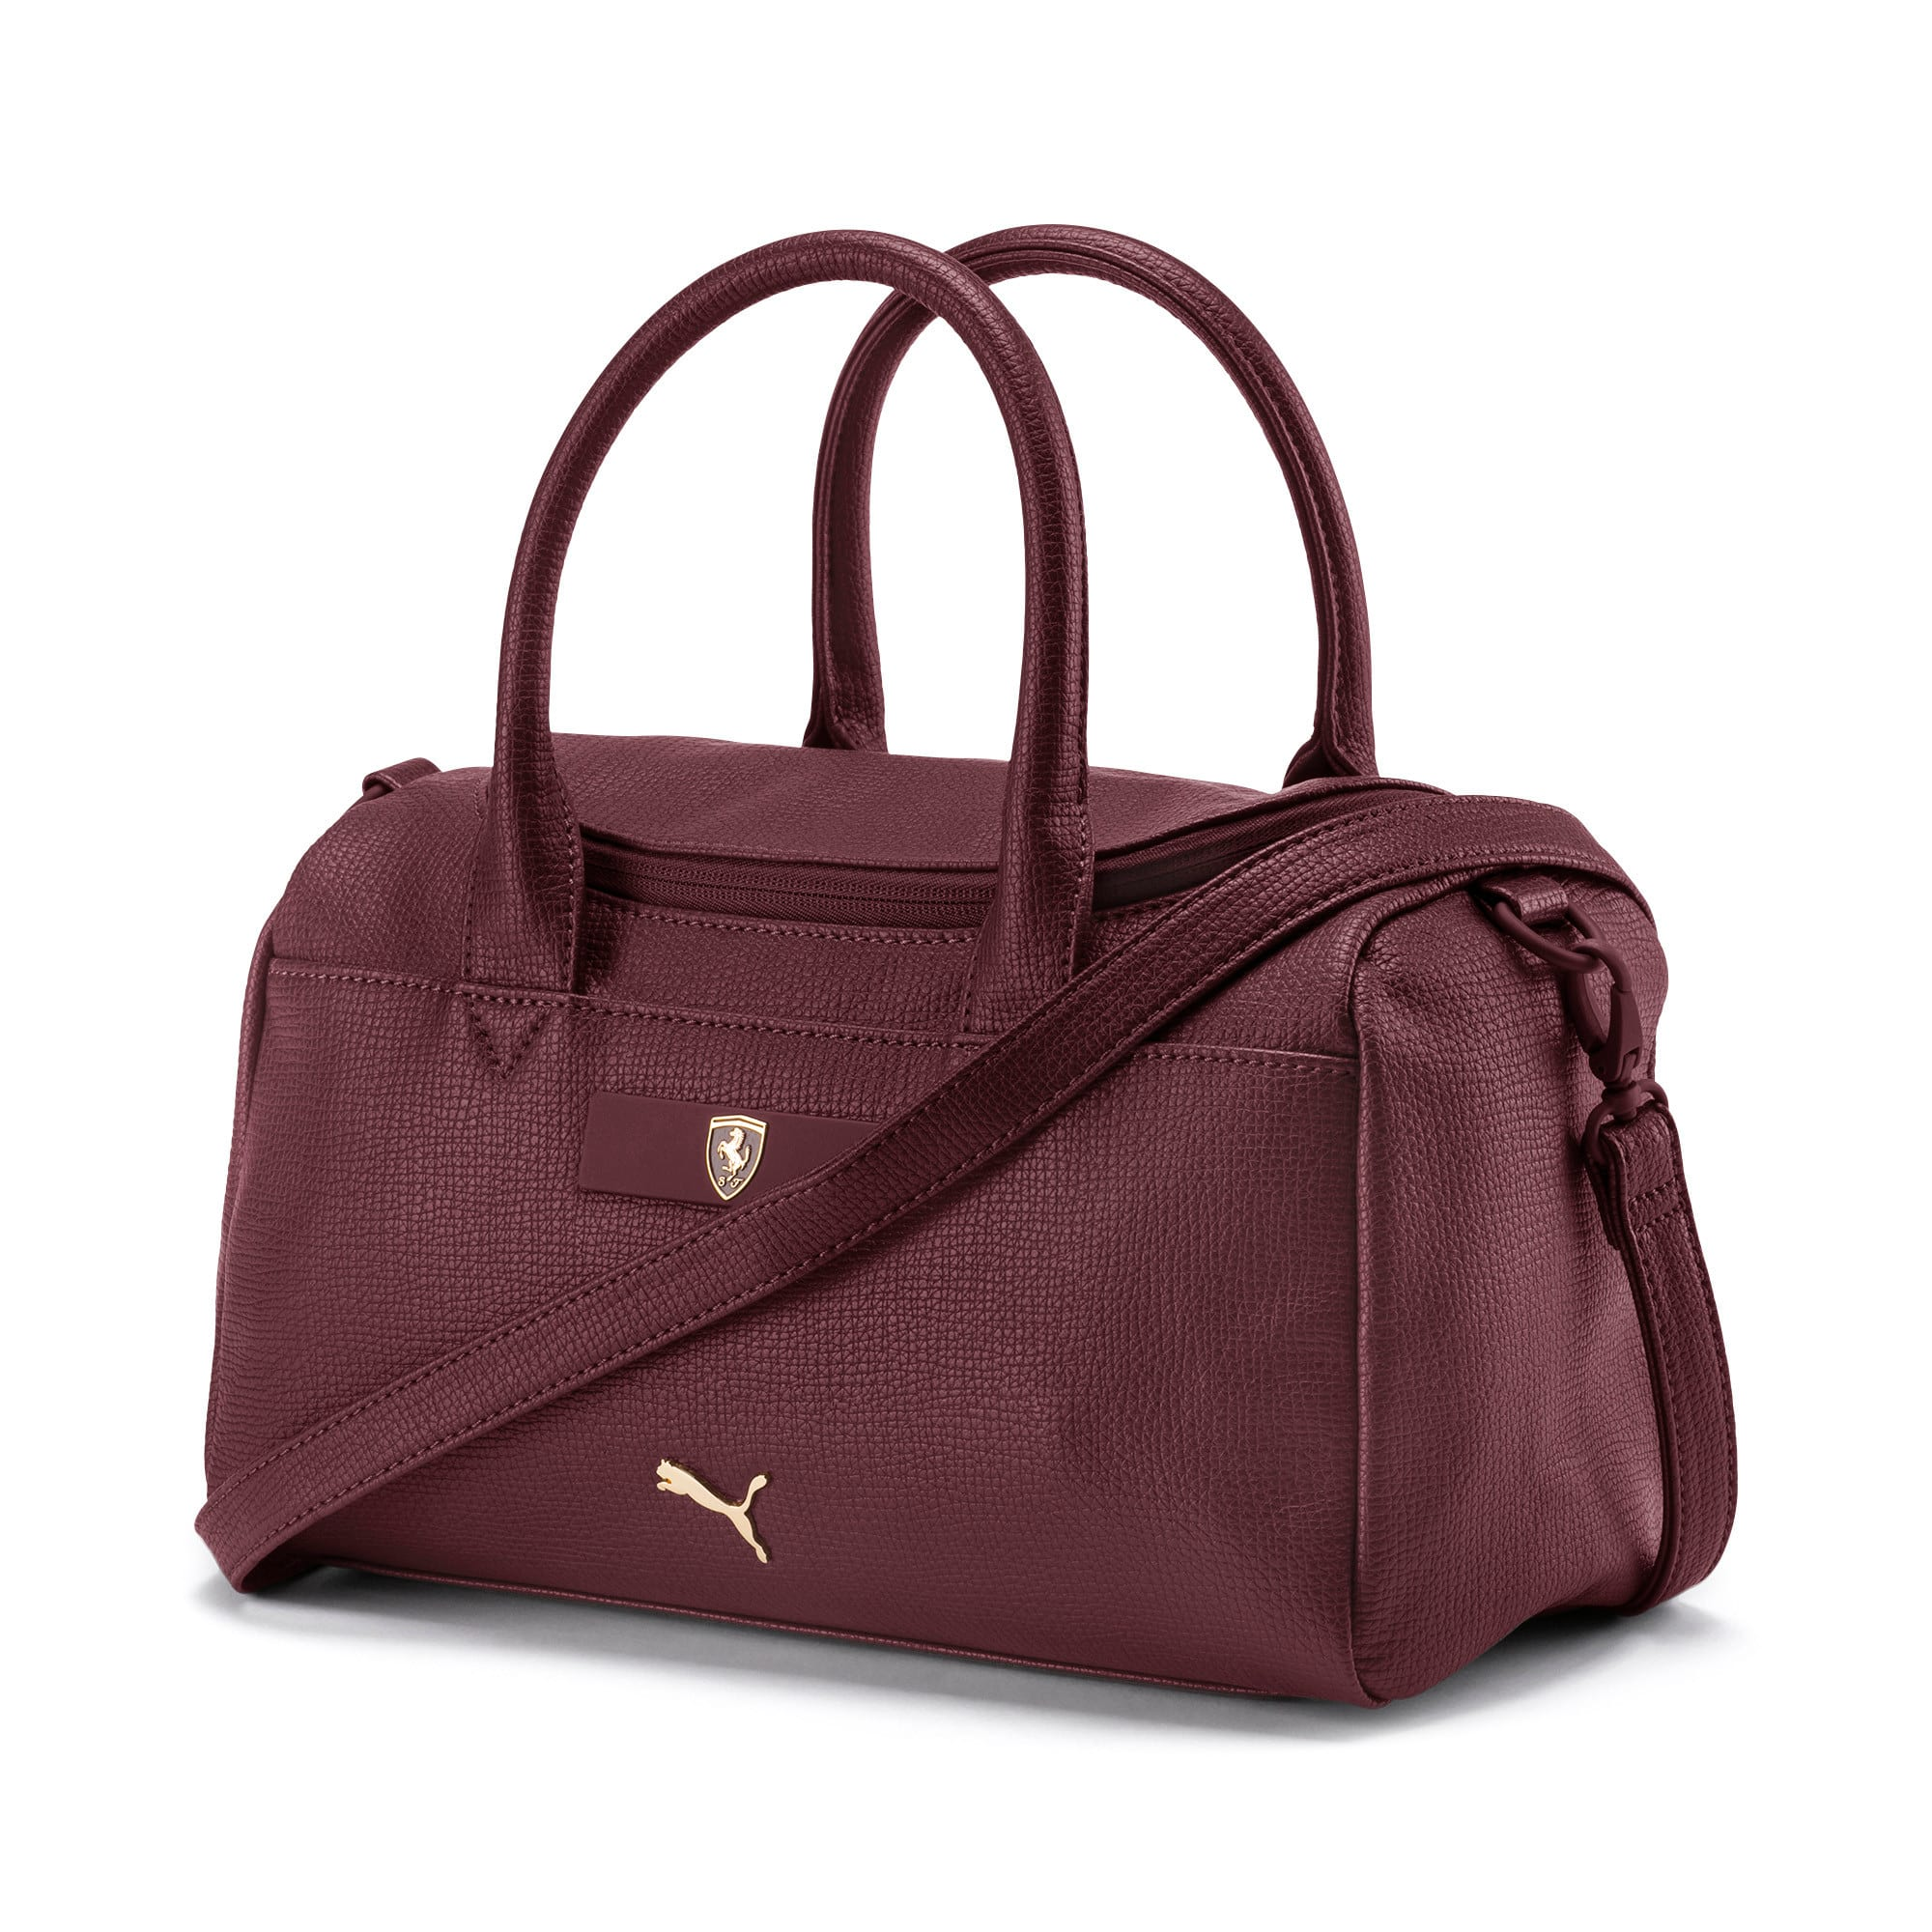 Thumbnail 1 of Ferrari Lifestyle Women's Handbag, Vineyard Wine, medium-IND